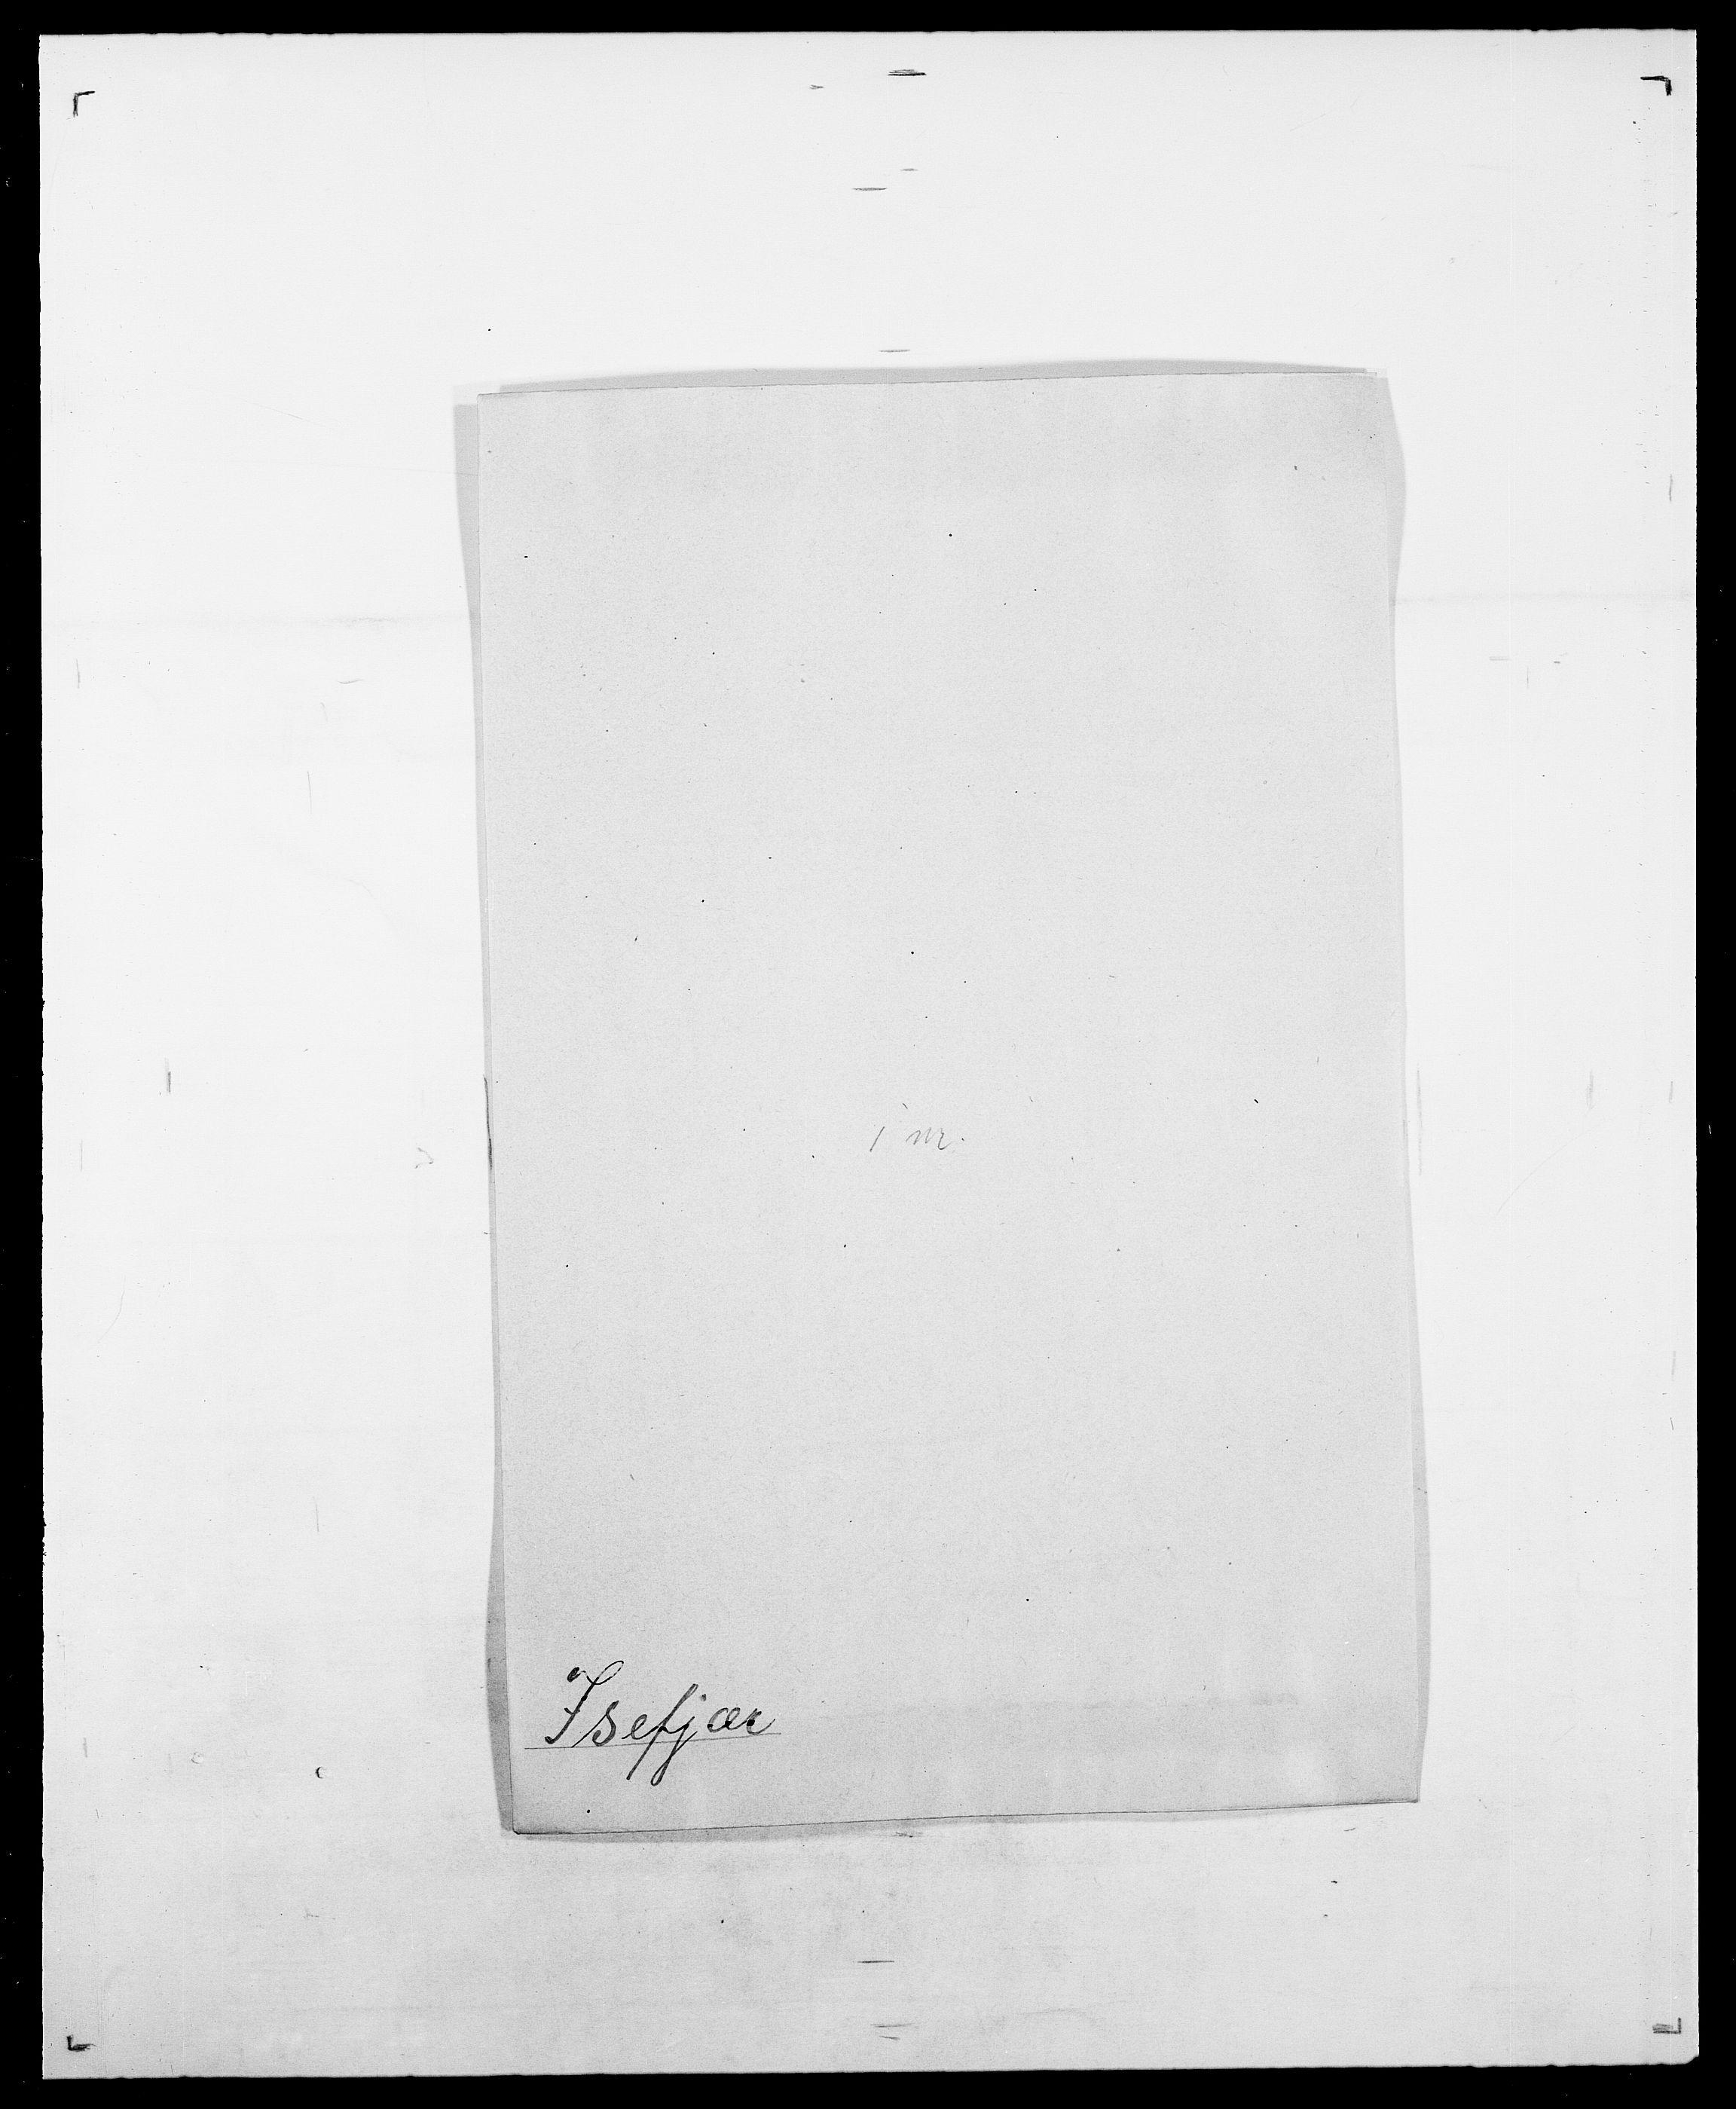 SAO, Delgobe, Charles Antoine - samling, D/Da/L0020: Irgens - Kjøsterud, s. 61